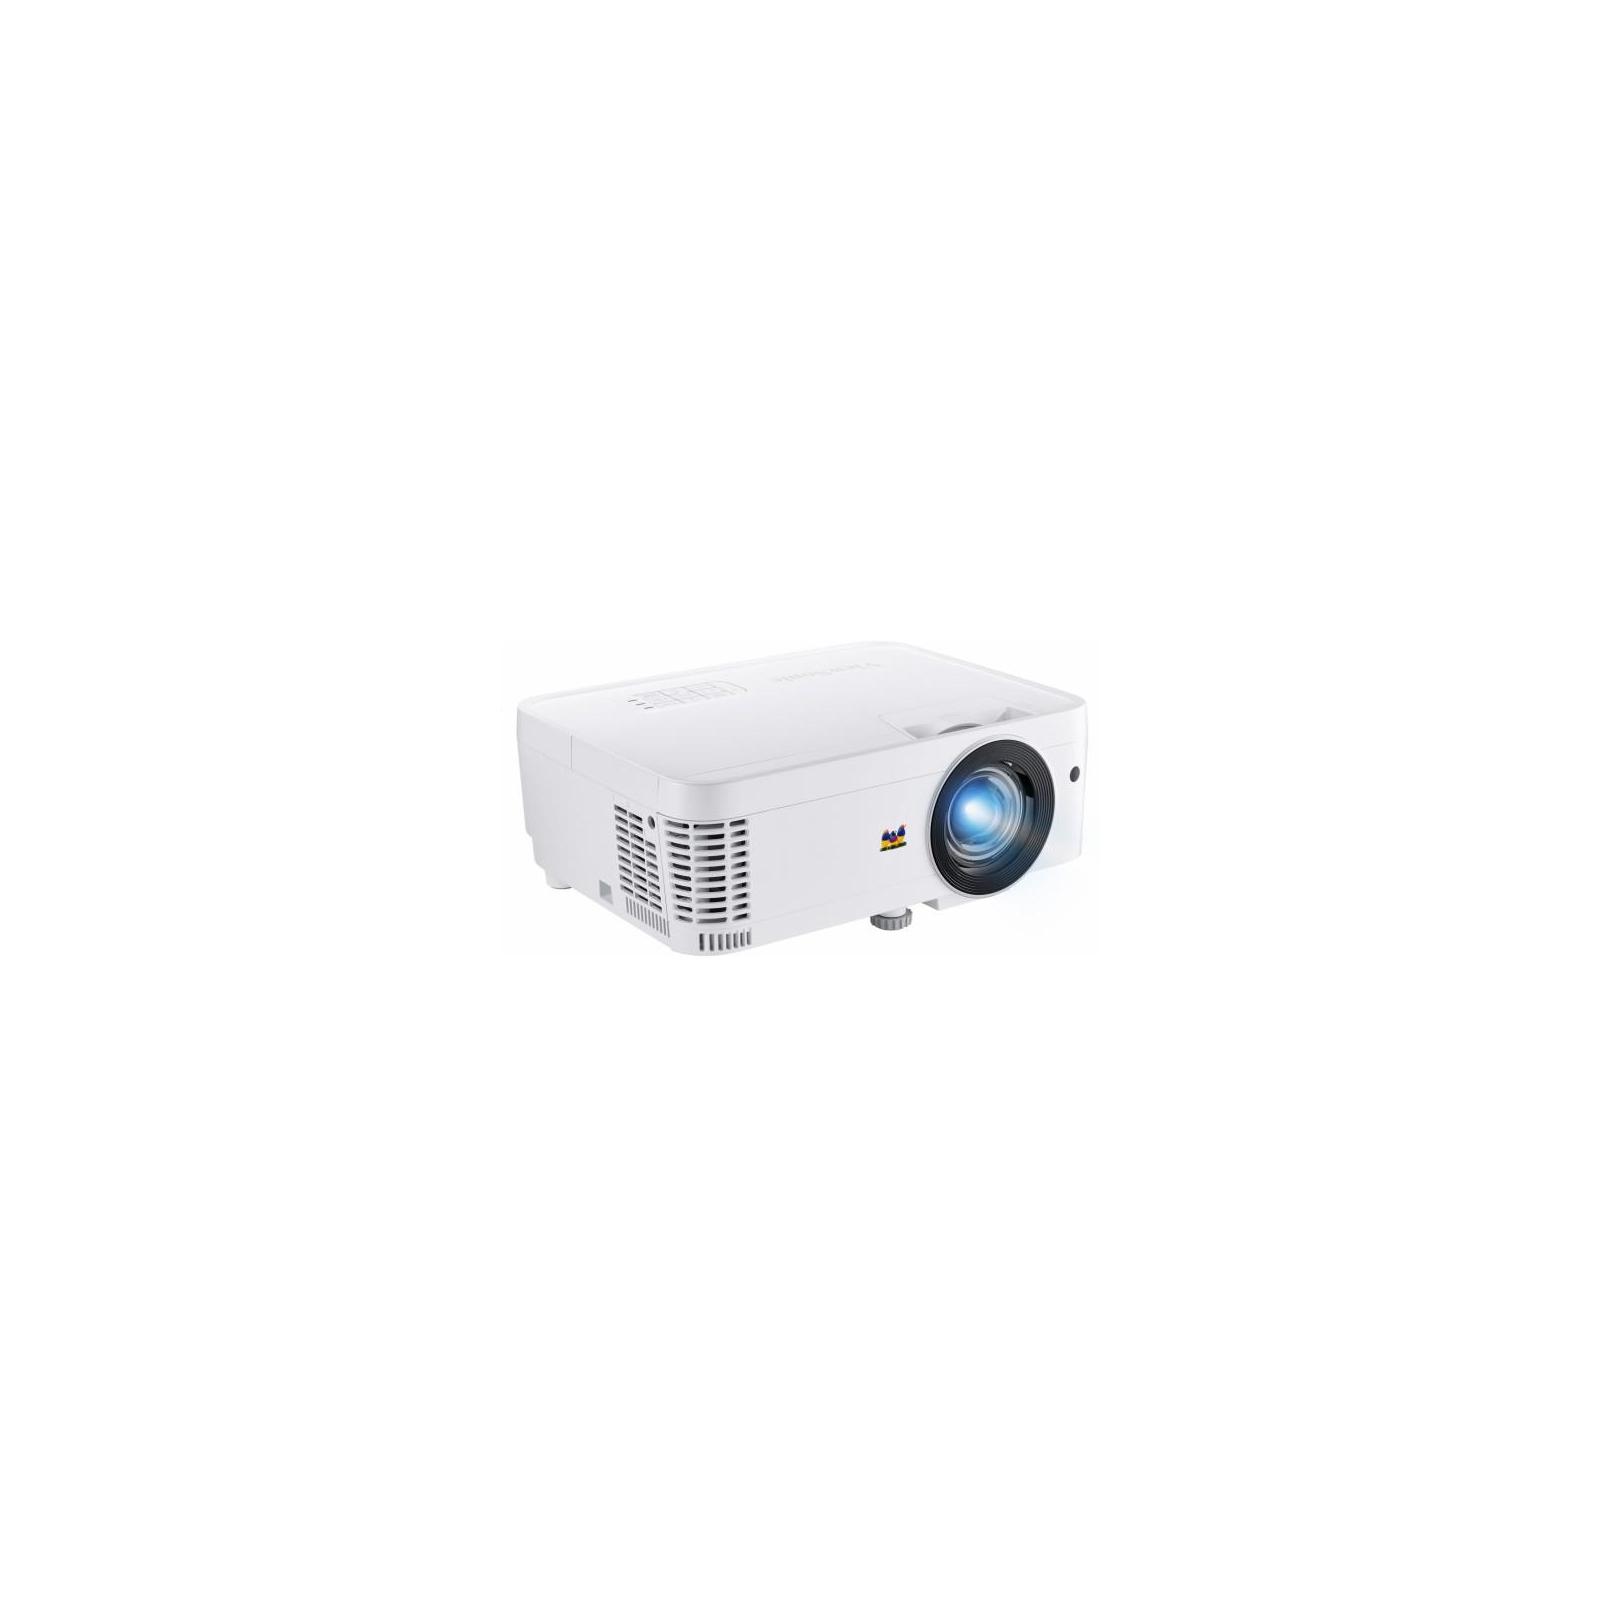 Проектор Viewsonic PS501W (VS17261) изображение 3